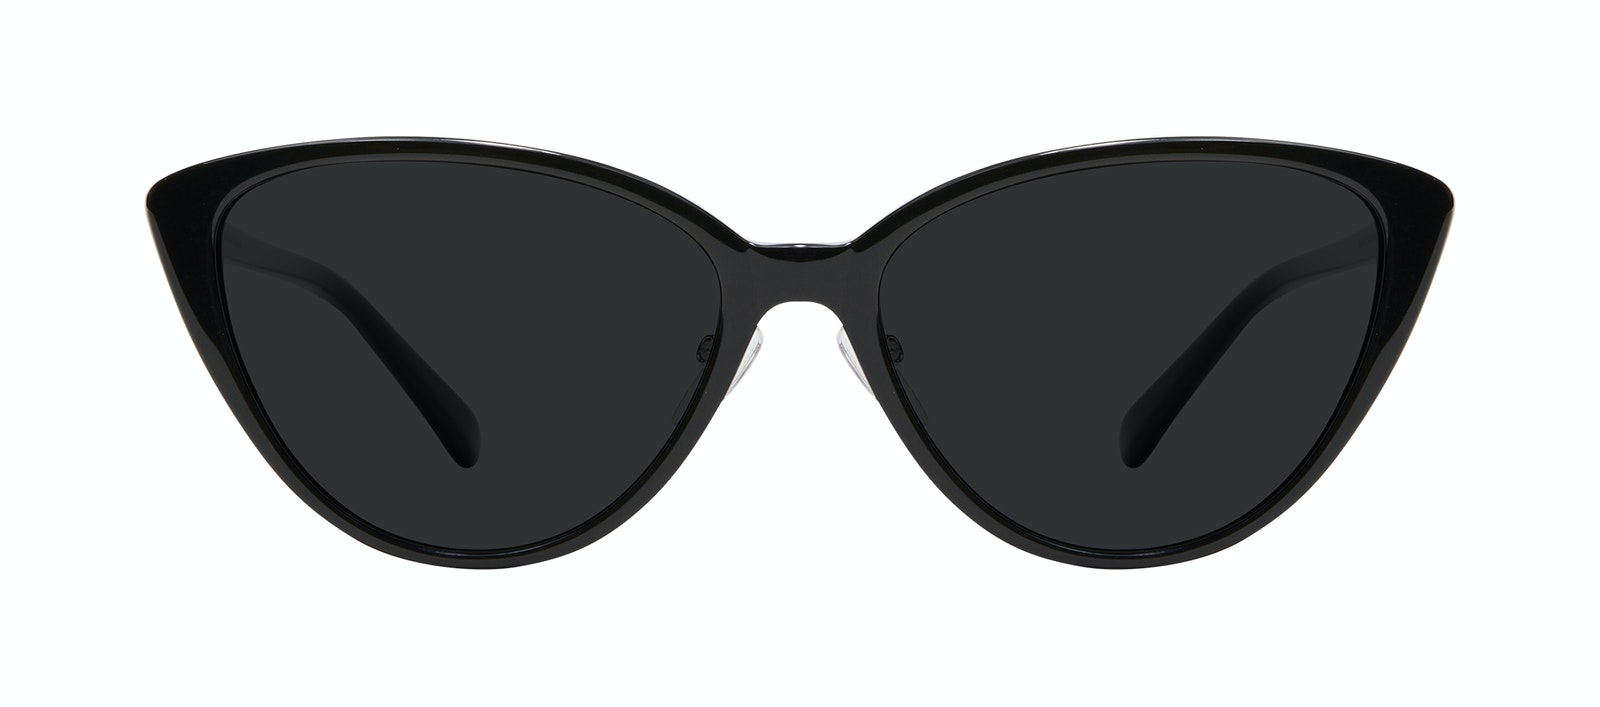 Affordable Fashion Glasses Cat Eye Sunglasses Women Sunset Onyx Front